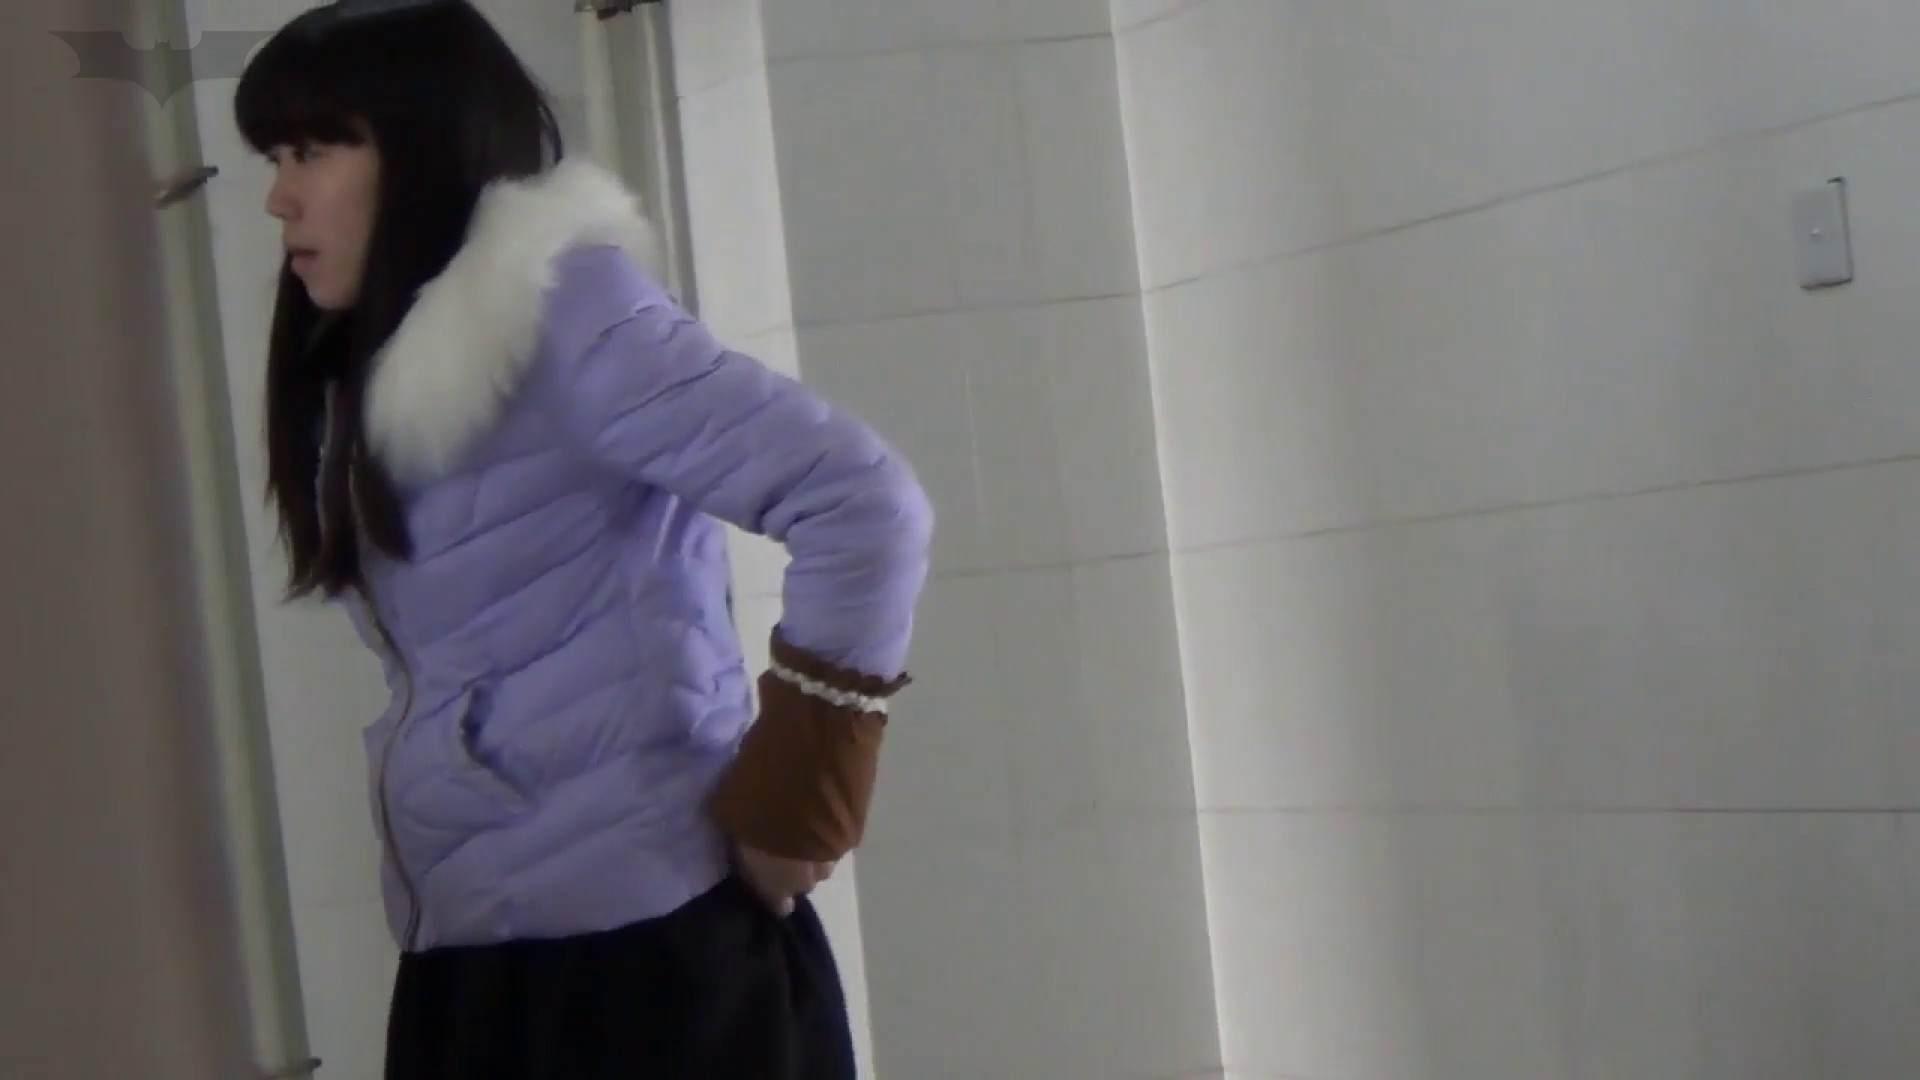 JD盗撮 美女の洗面所の秘密 Vol.26 OLのボディ 盗み撮り動画キャプチャ 73PIX 72